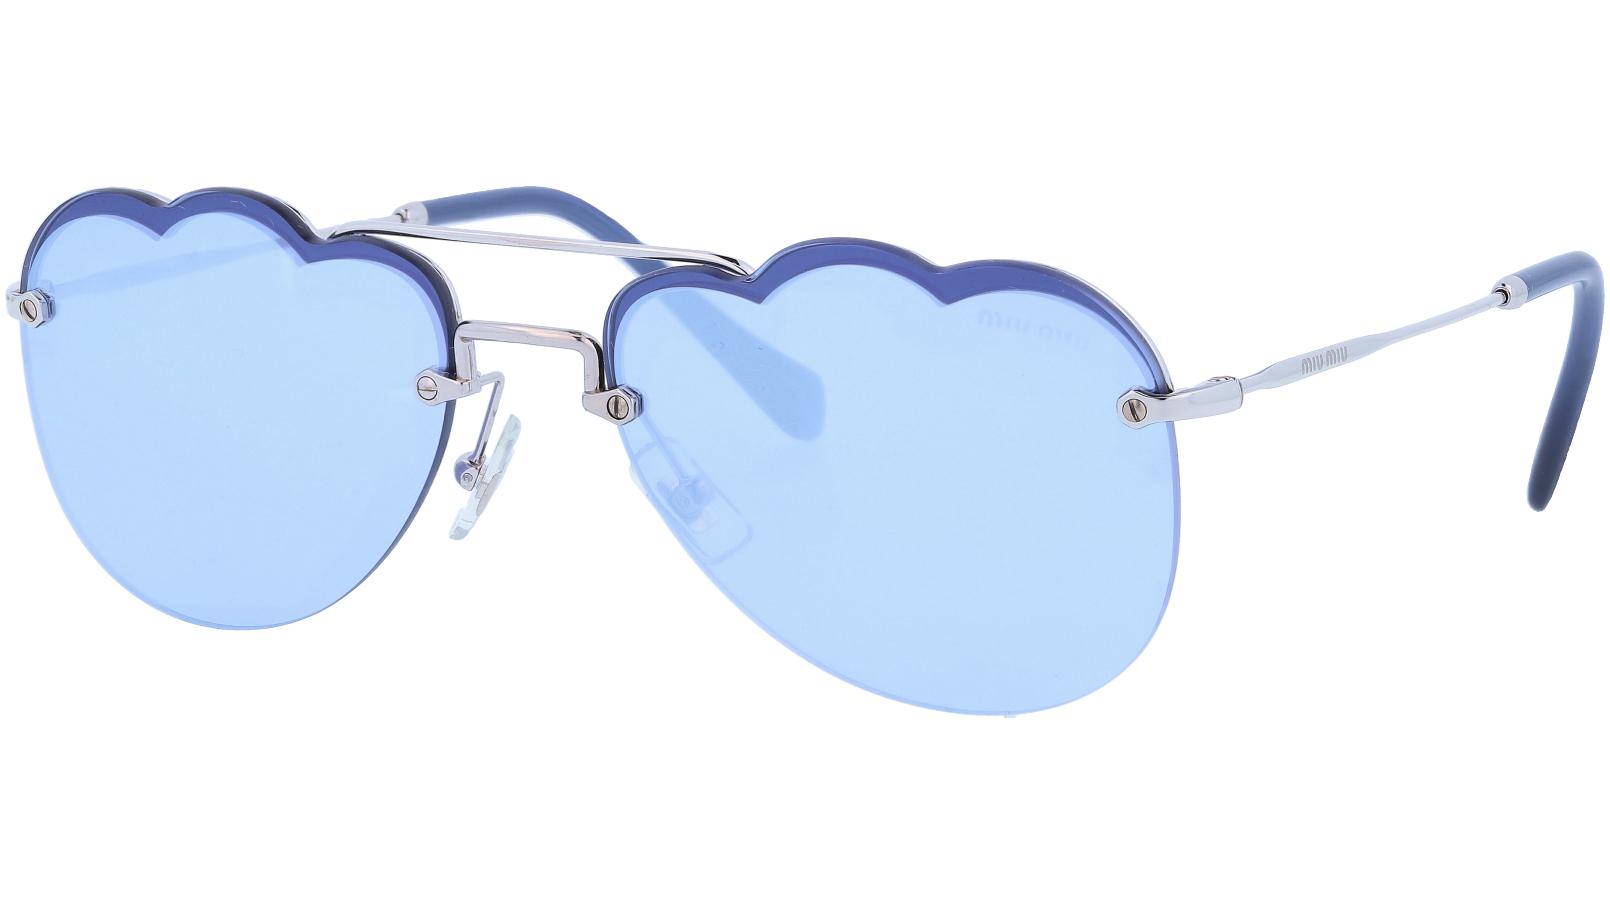 Miu Miu MU56US 1BC178 58 Blue Sunglasses